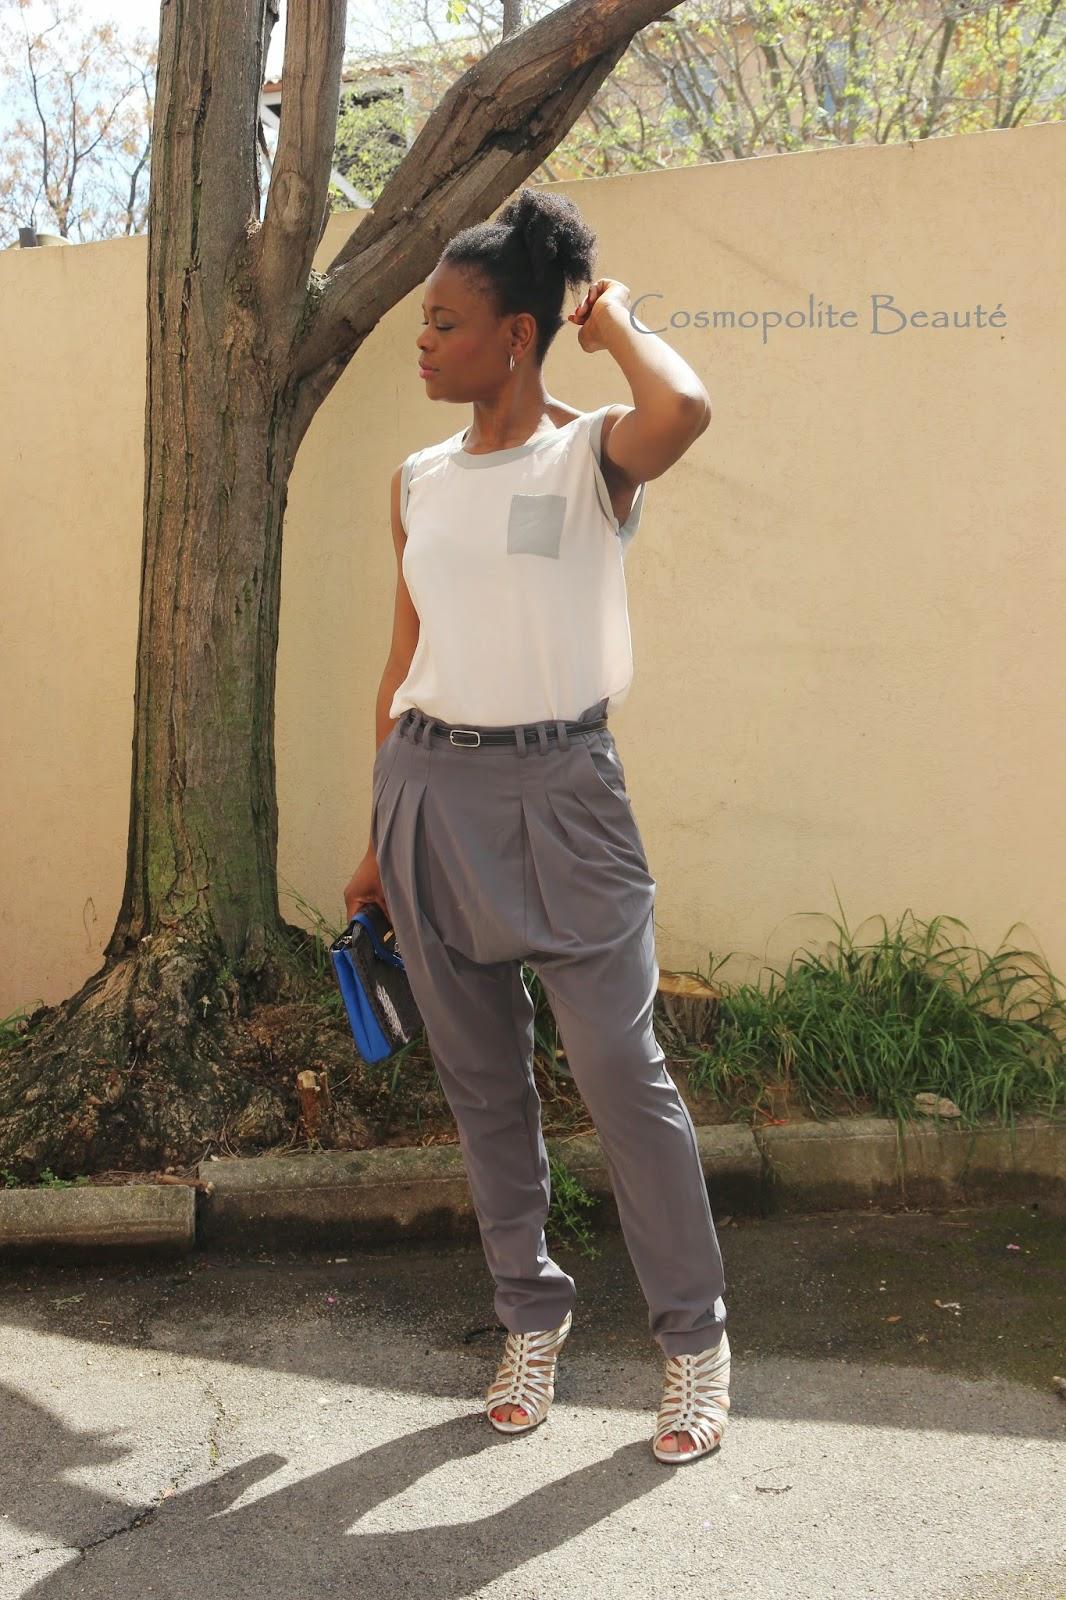 byn french challenge, lookbook, cosmopolite beauté, cosmopolitan beauty, tenue, pastel, look, sarouel, pantalon,  sandales à talons